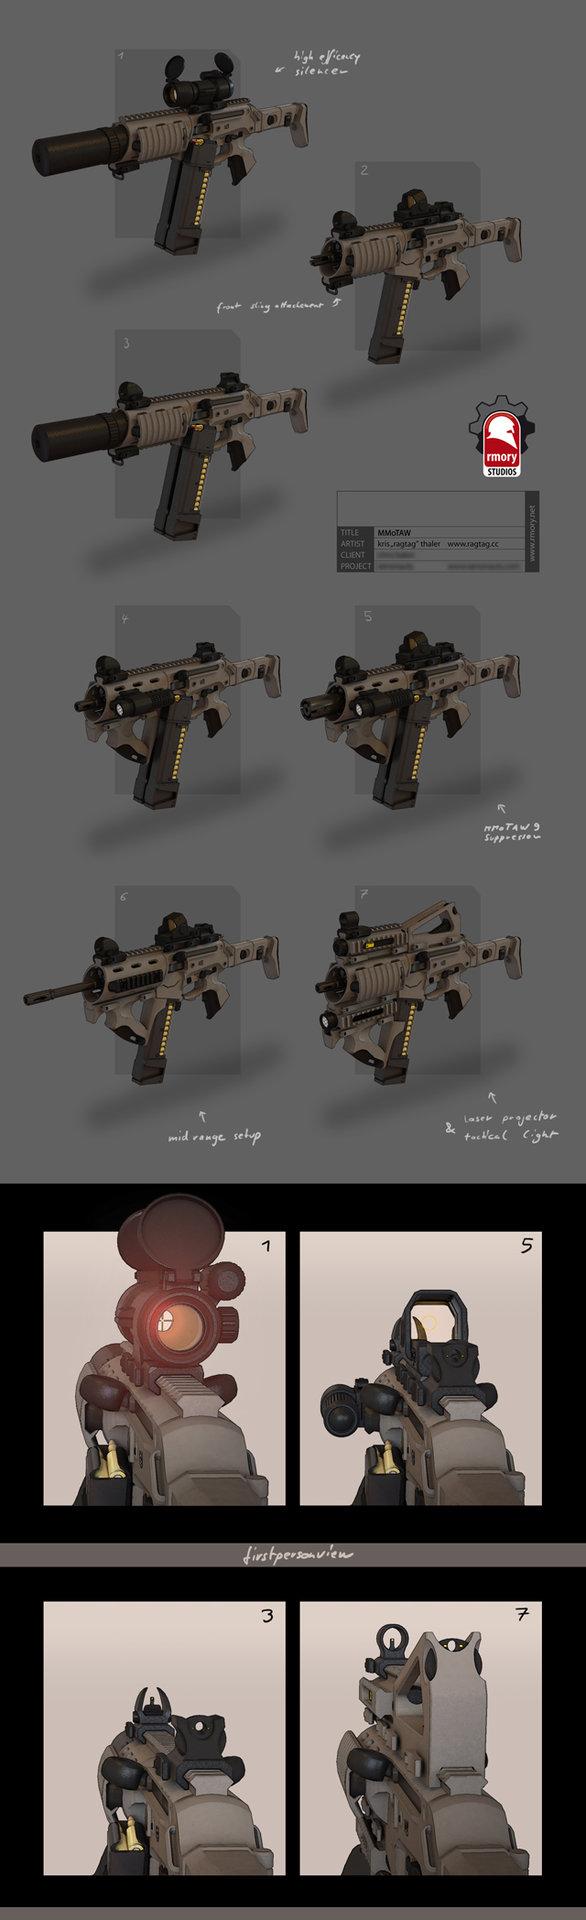 Kris thaler mmotaw conceptsheet1 web